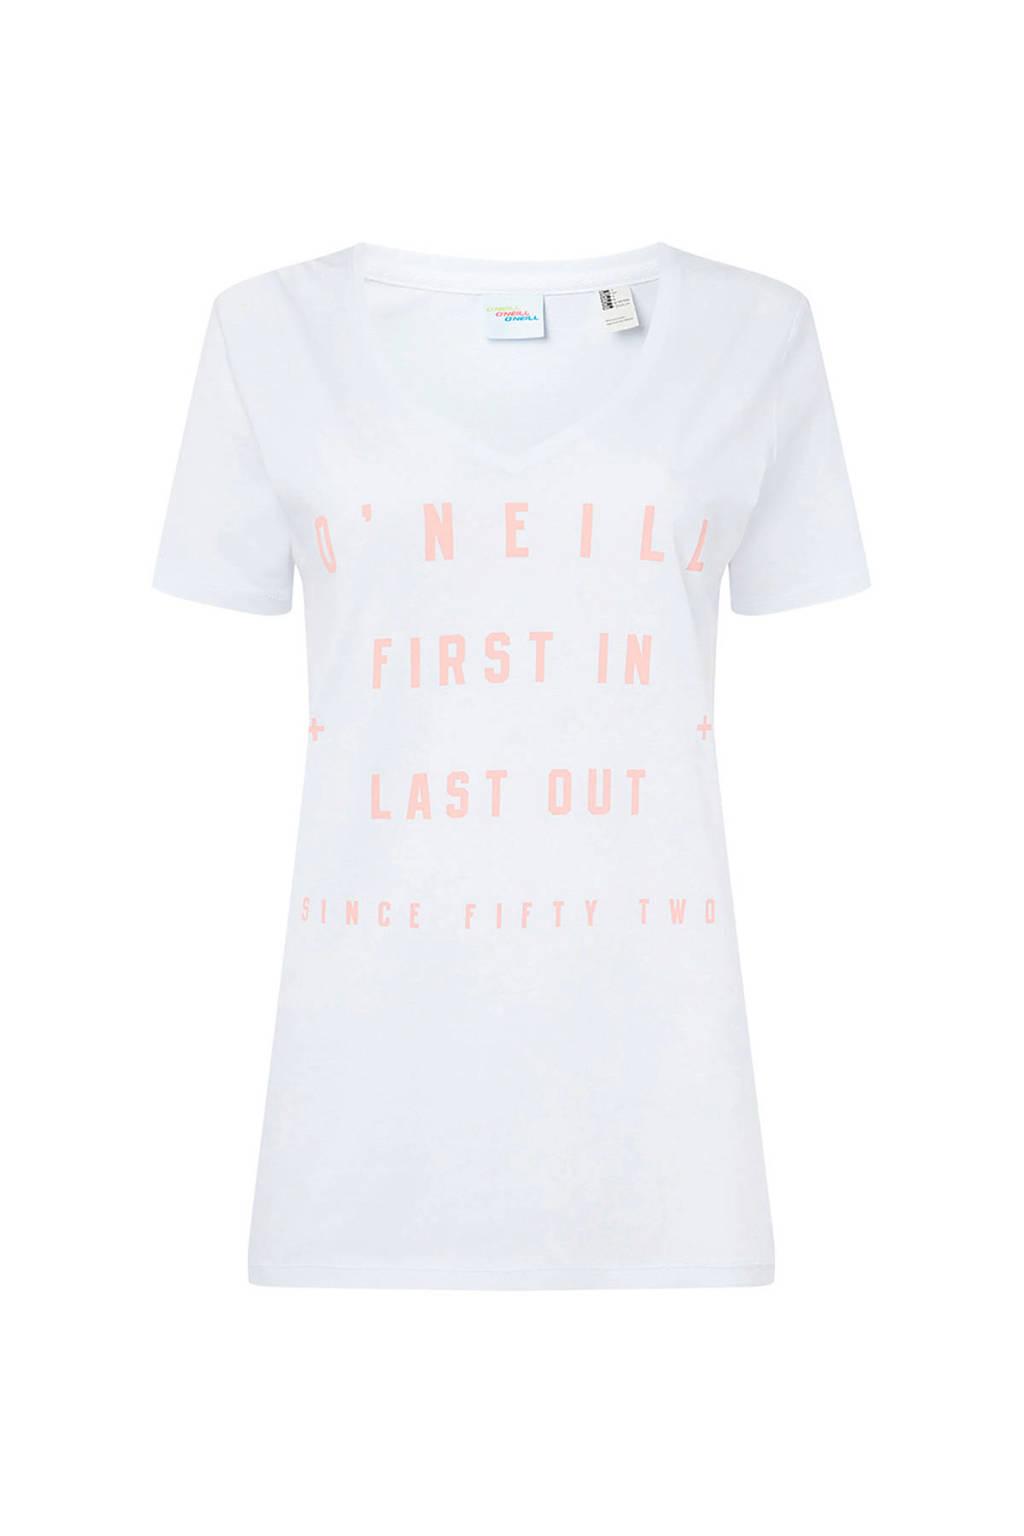 O'Neill T-shirt met tekst wit, Wit